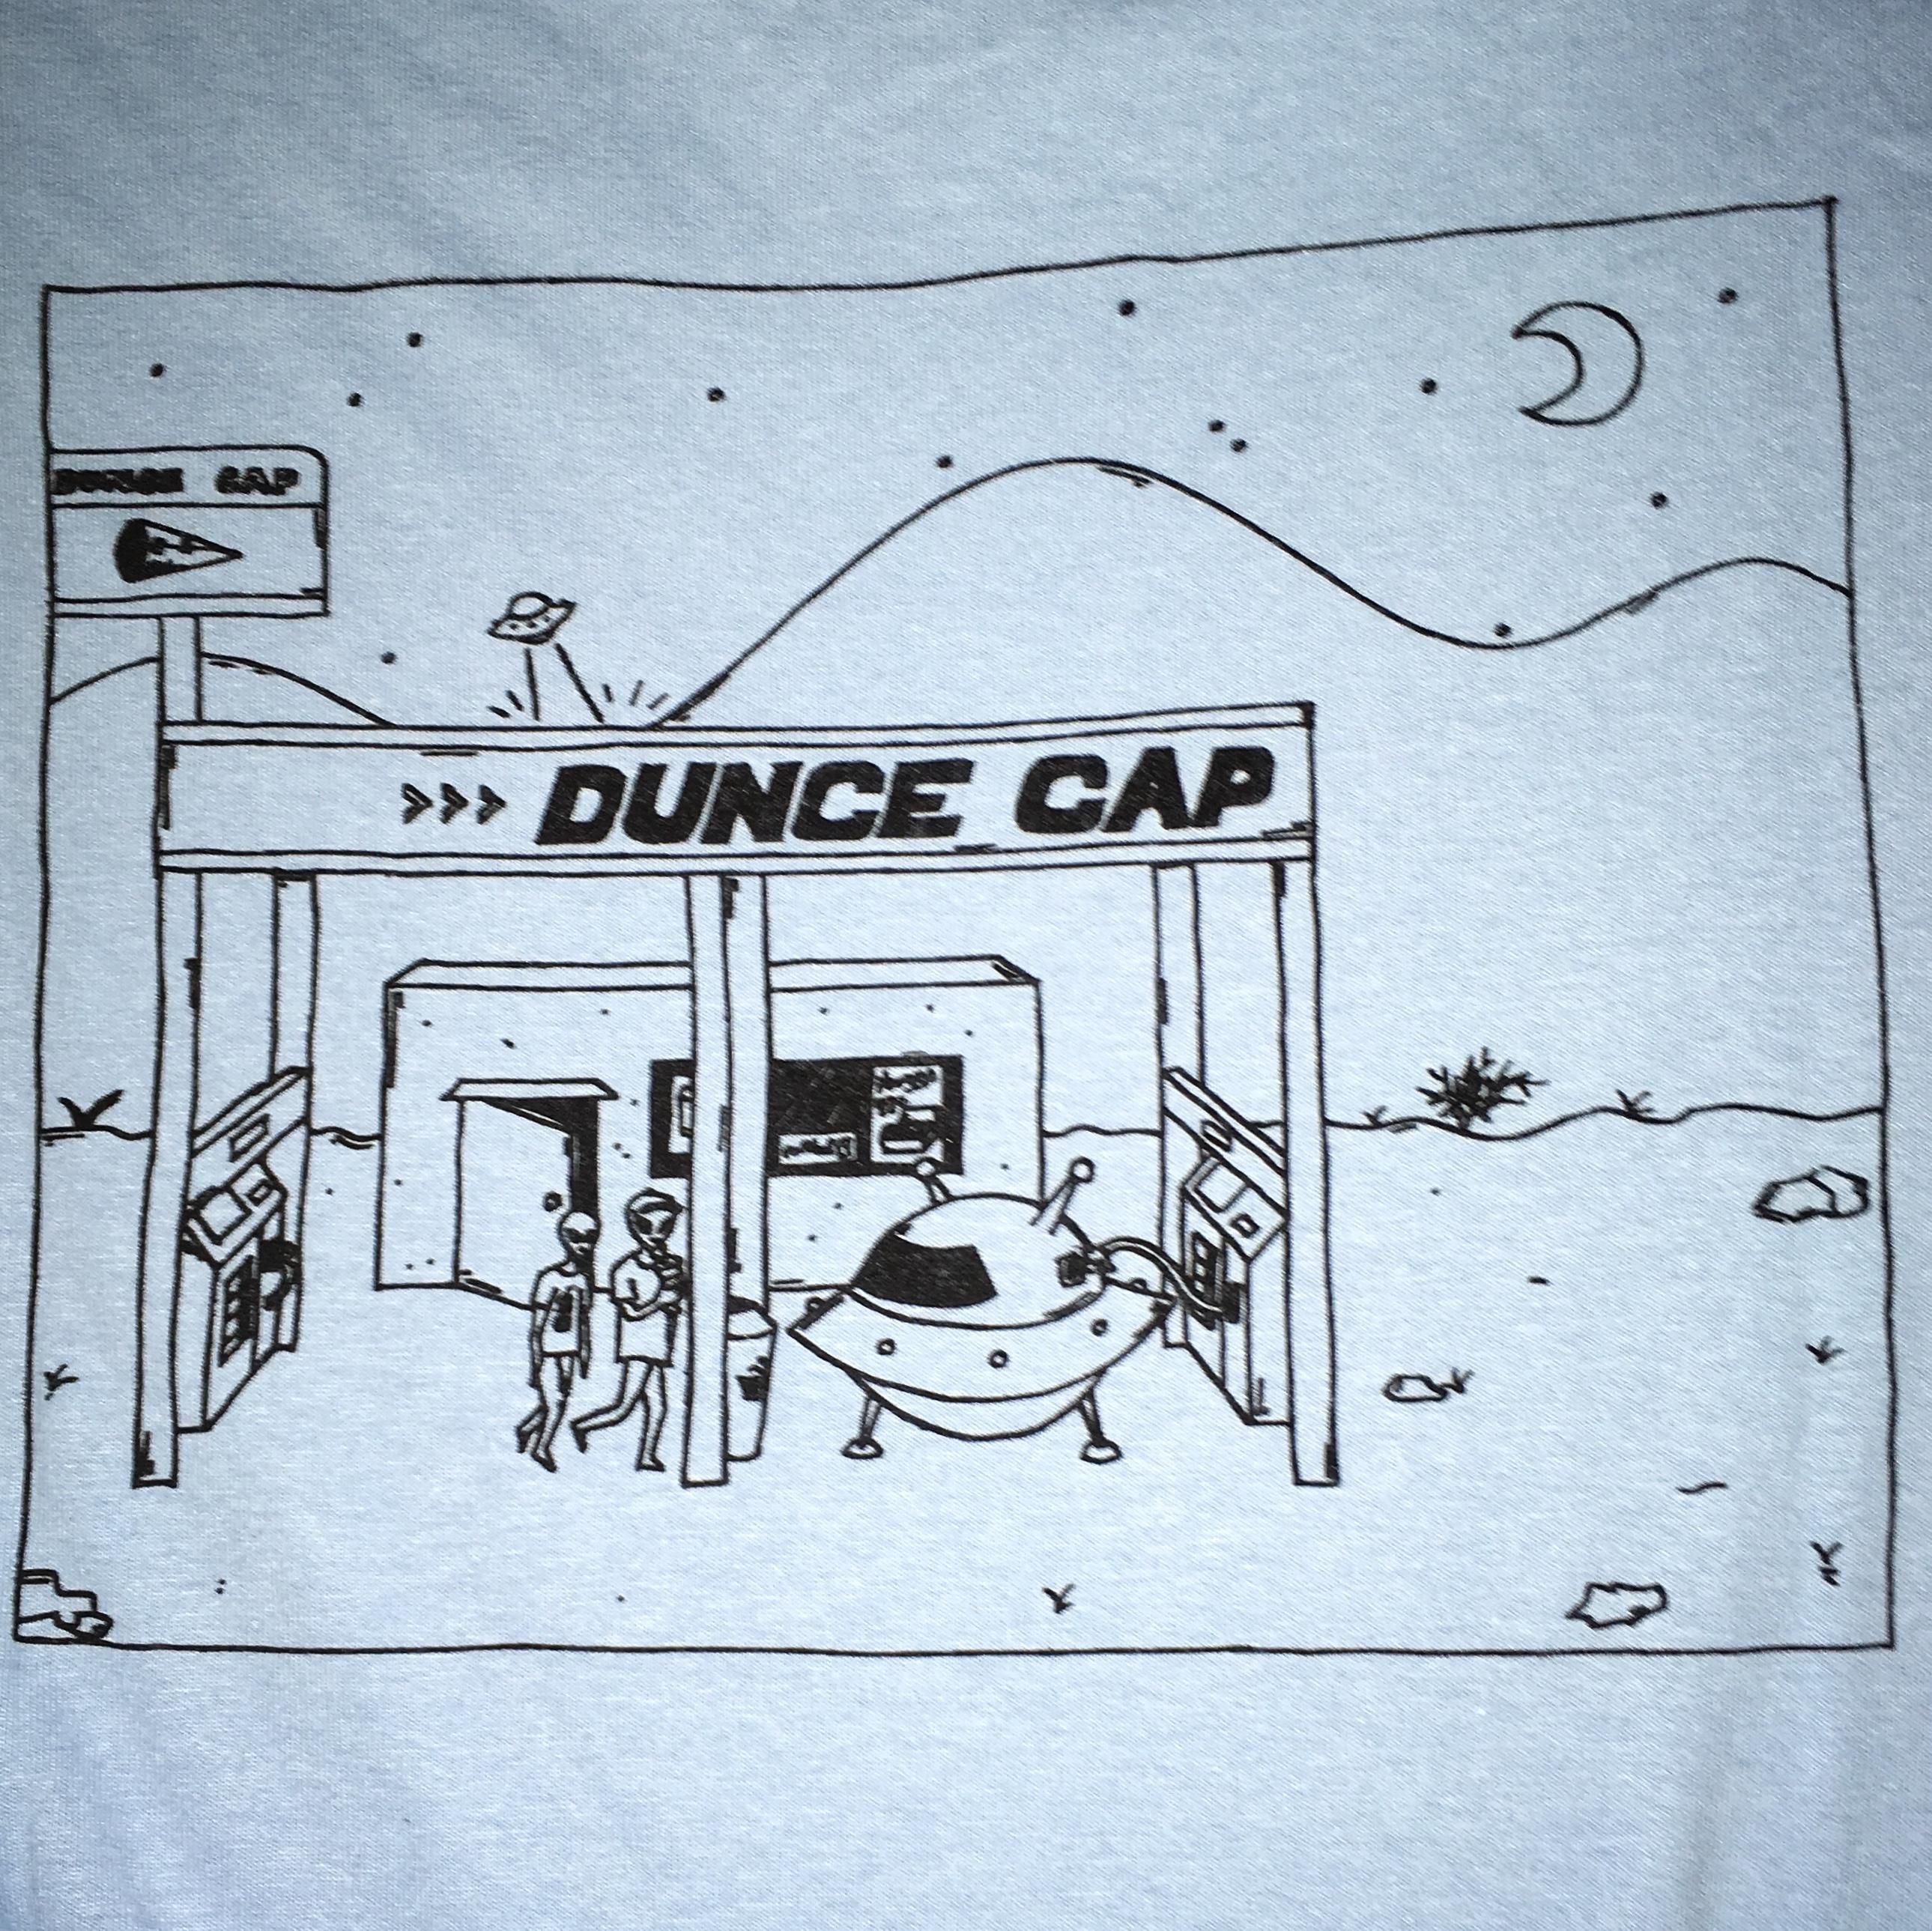 Dunce Cap - Space